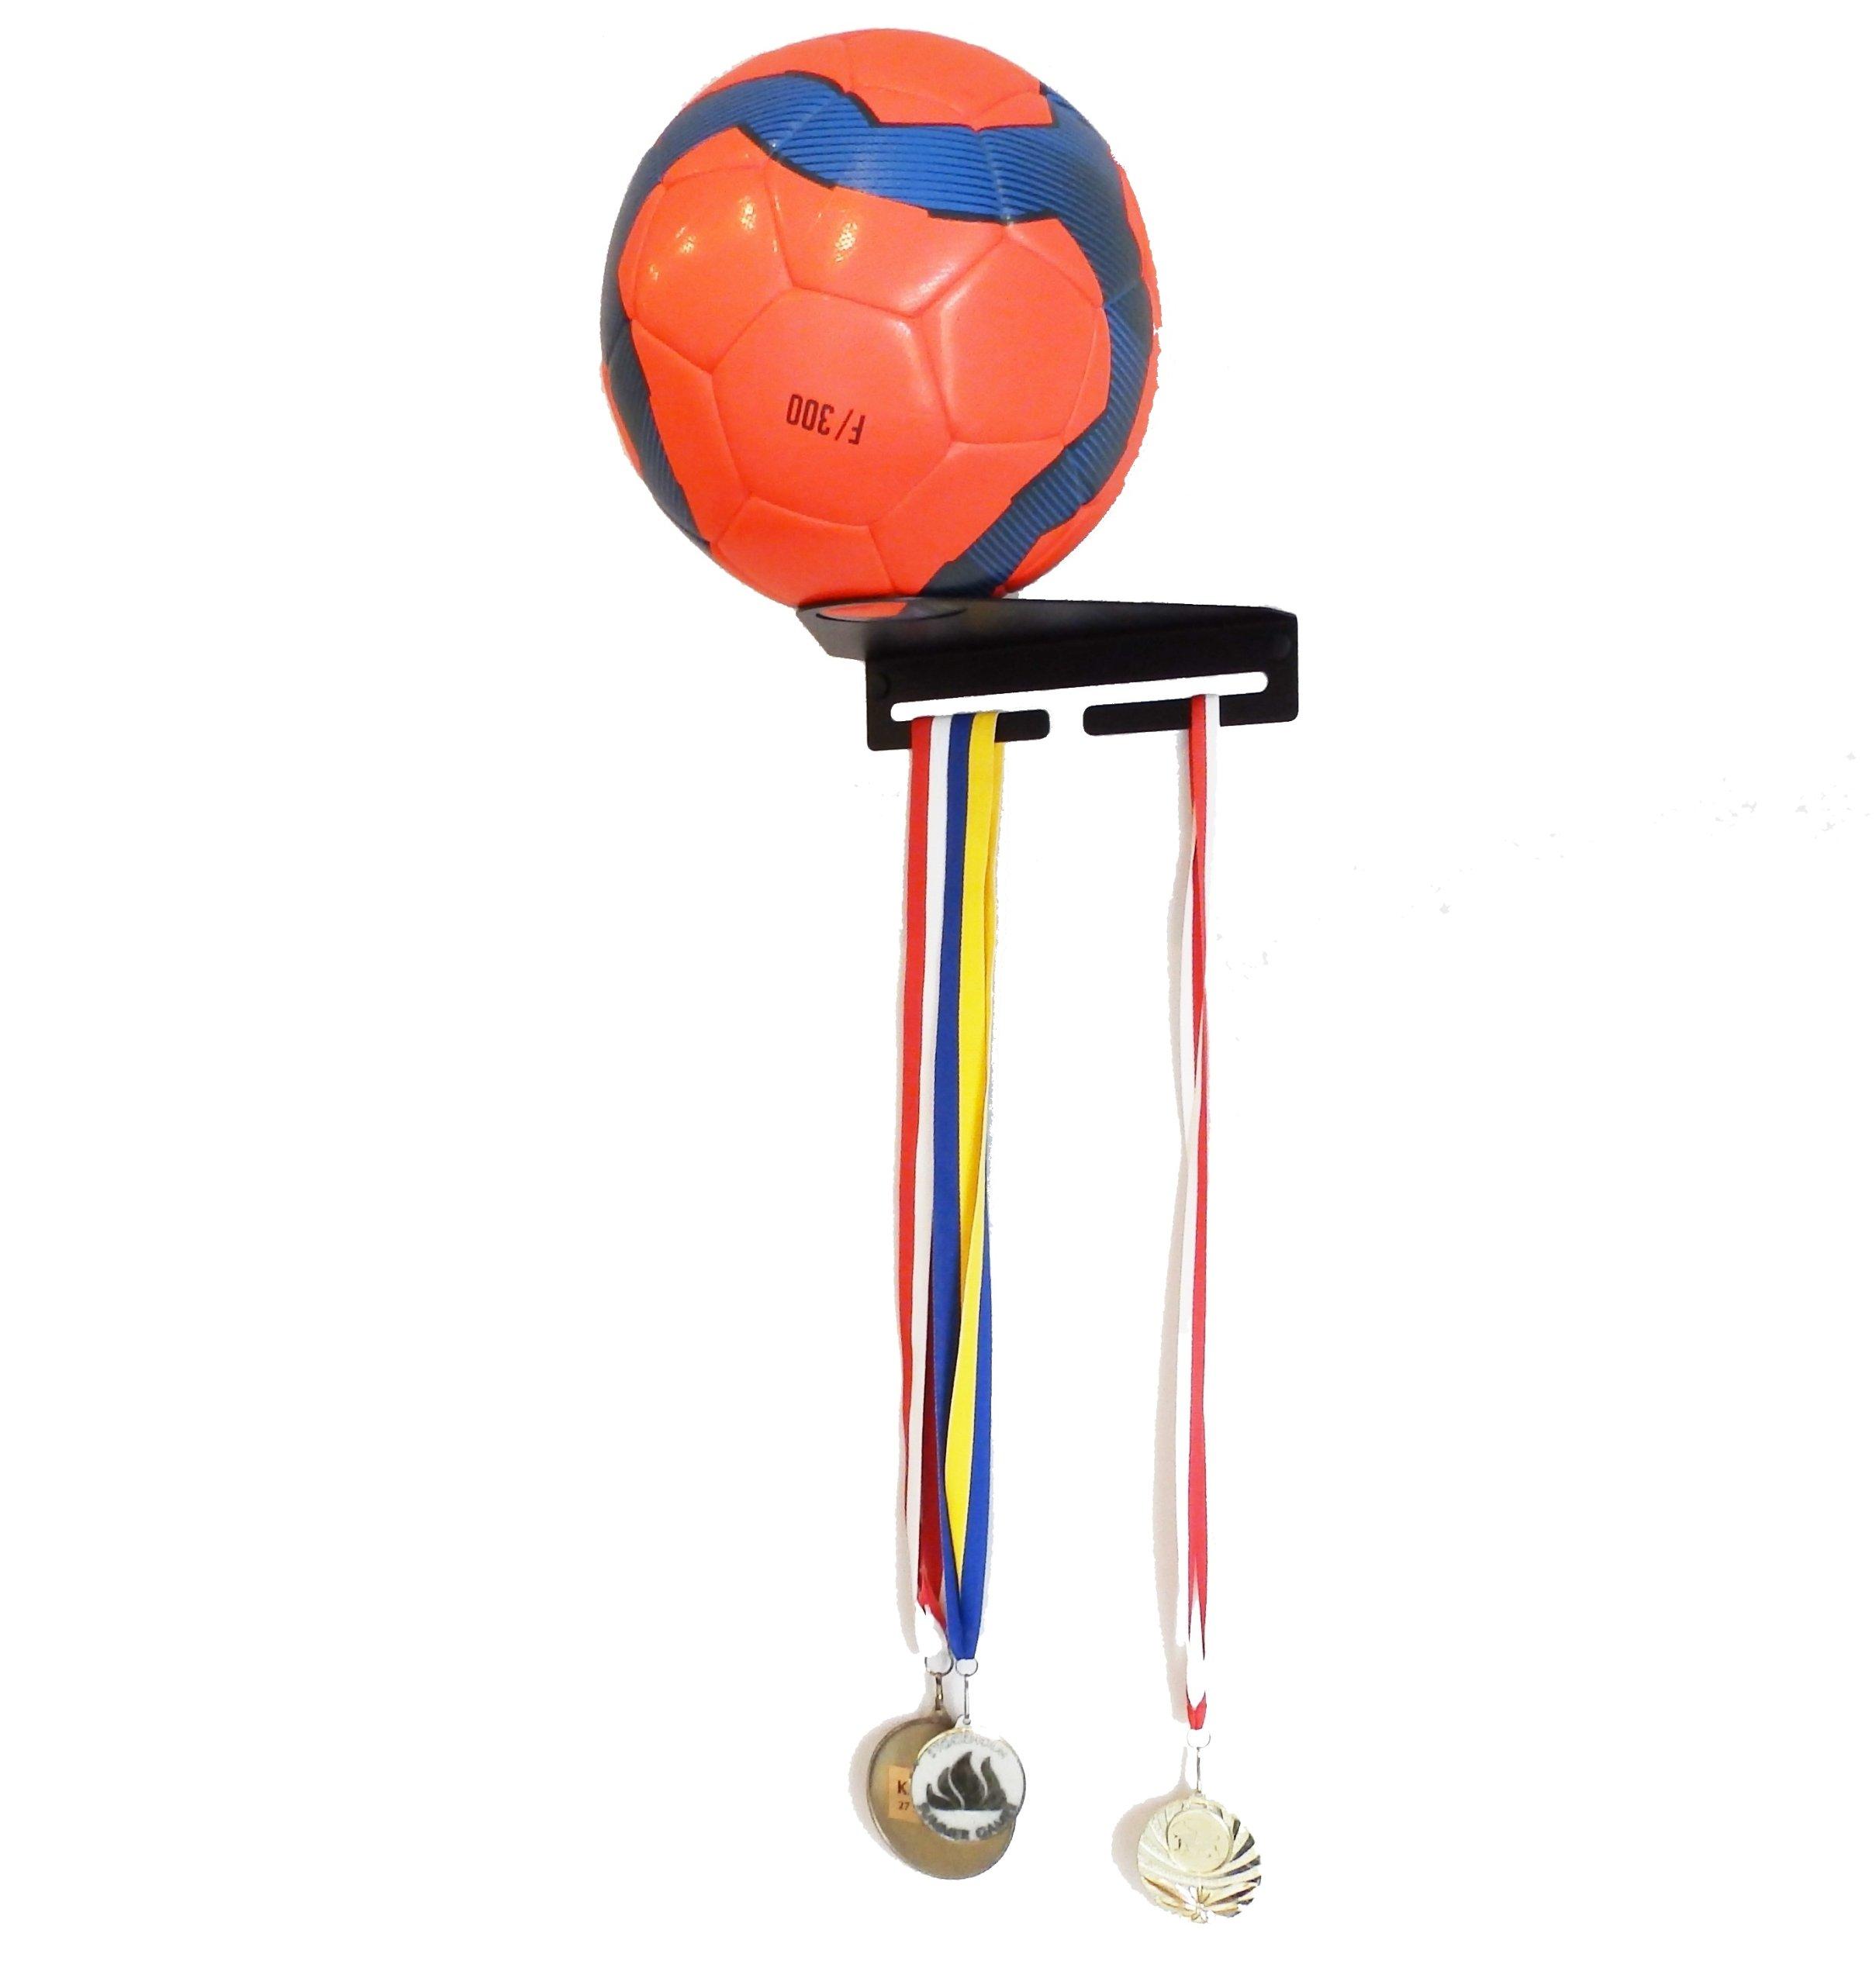 Wieszak na medale PIŁKA NOŻNA medalówka piłkarze